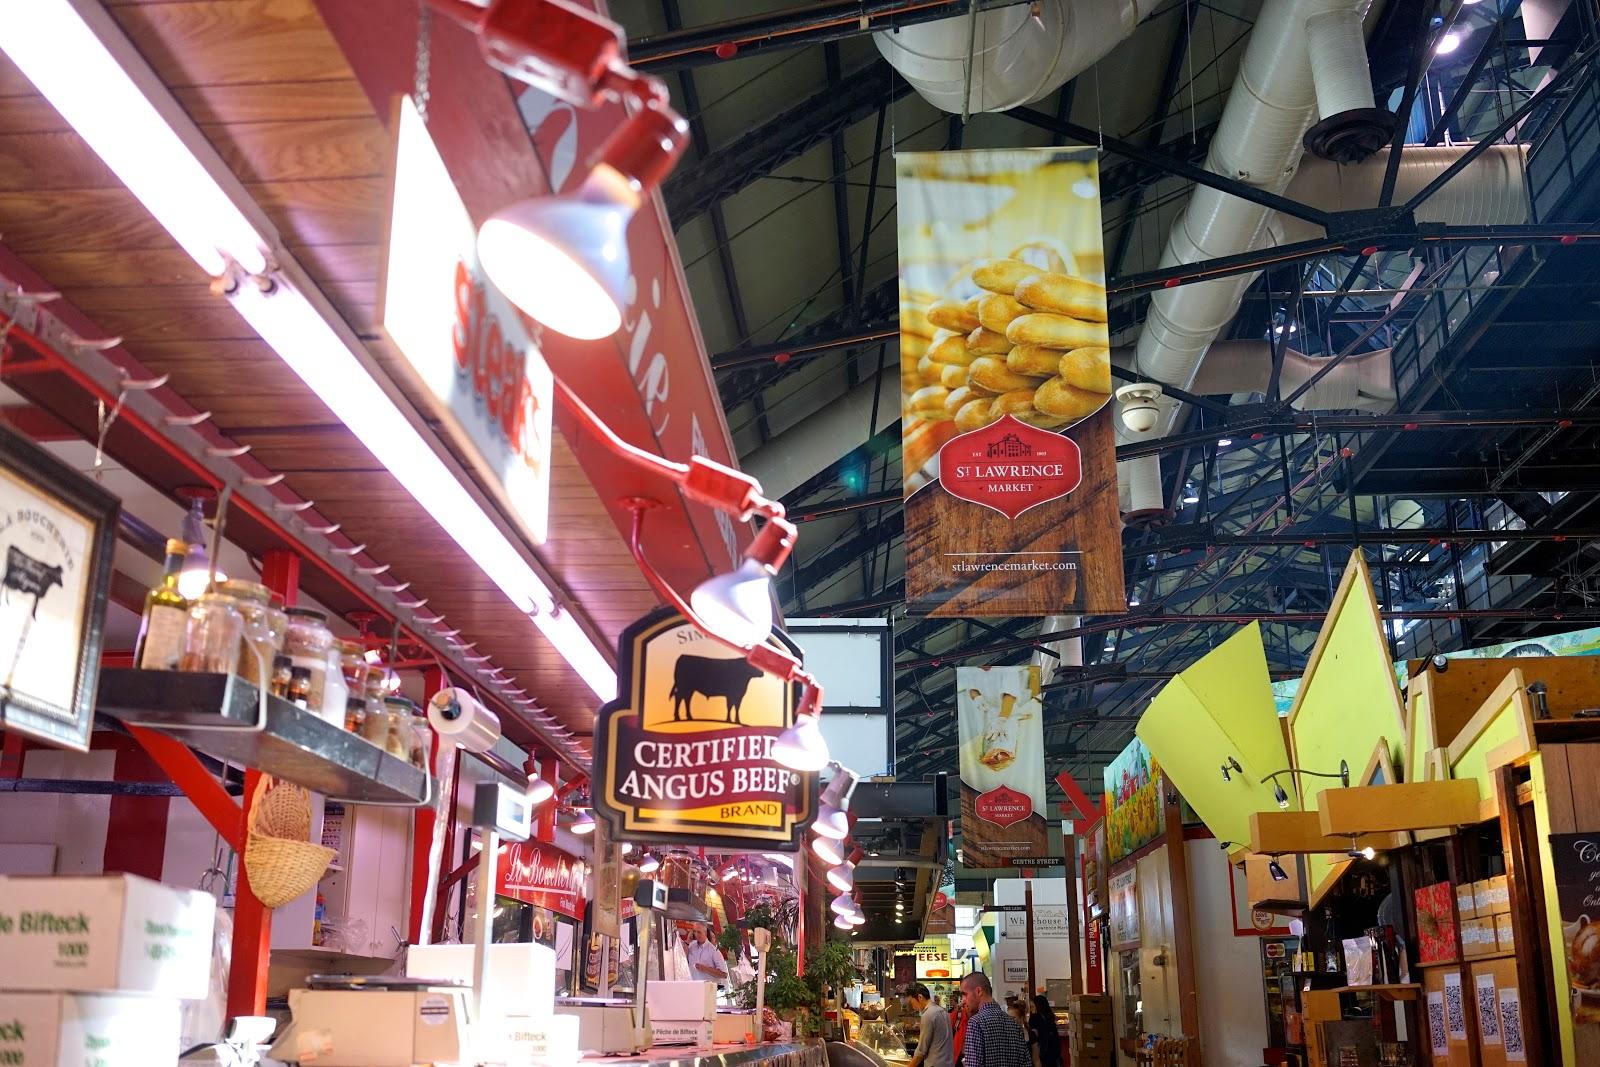 st lawrence food market